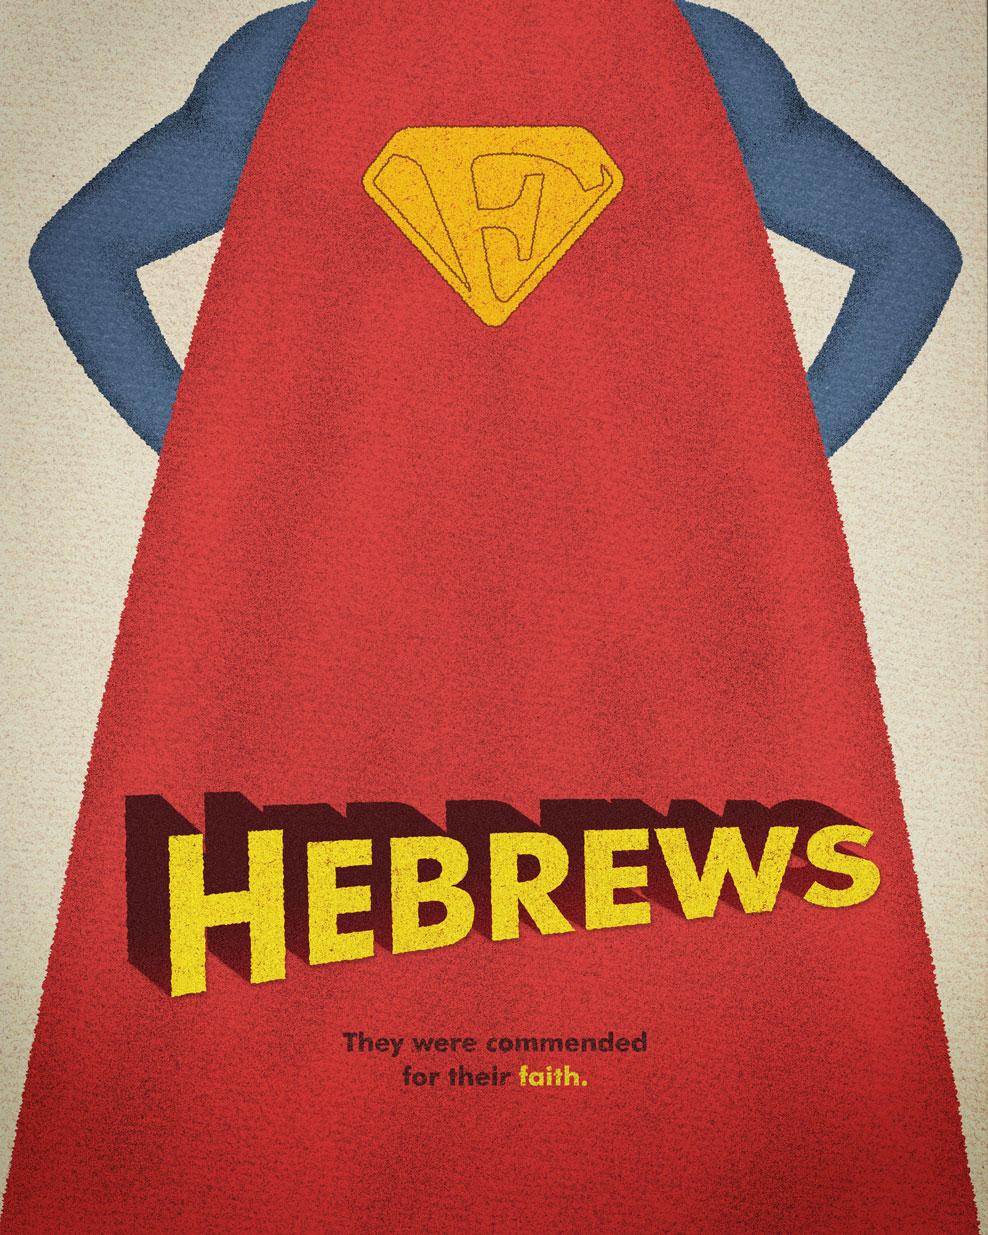 Hebrews_988.jpg